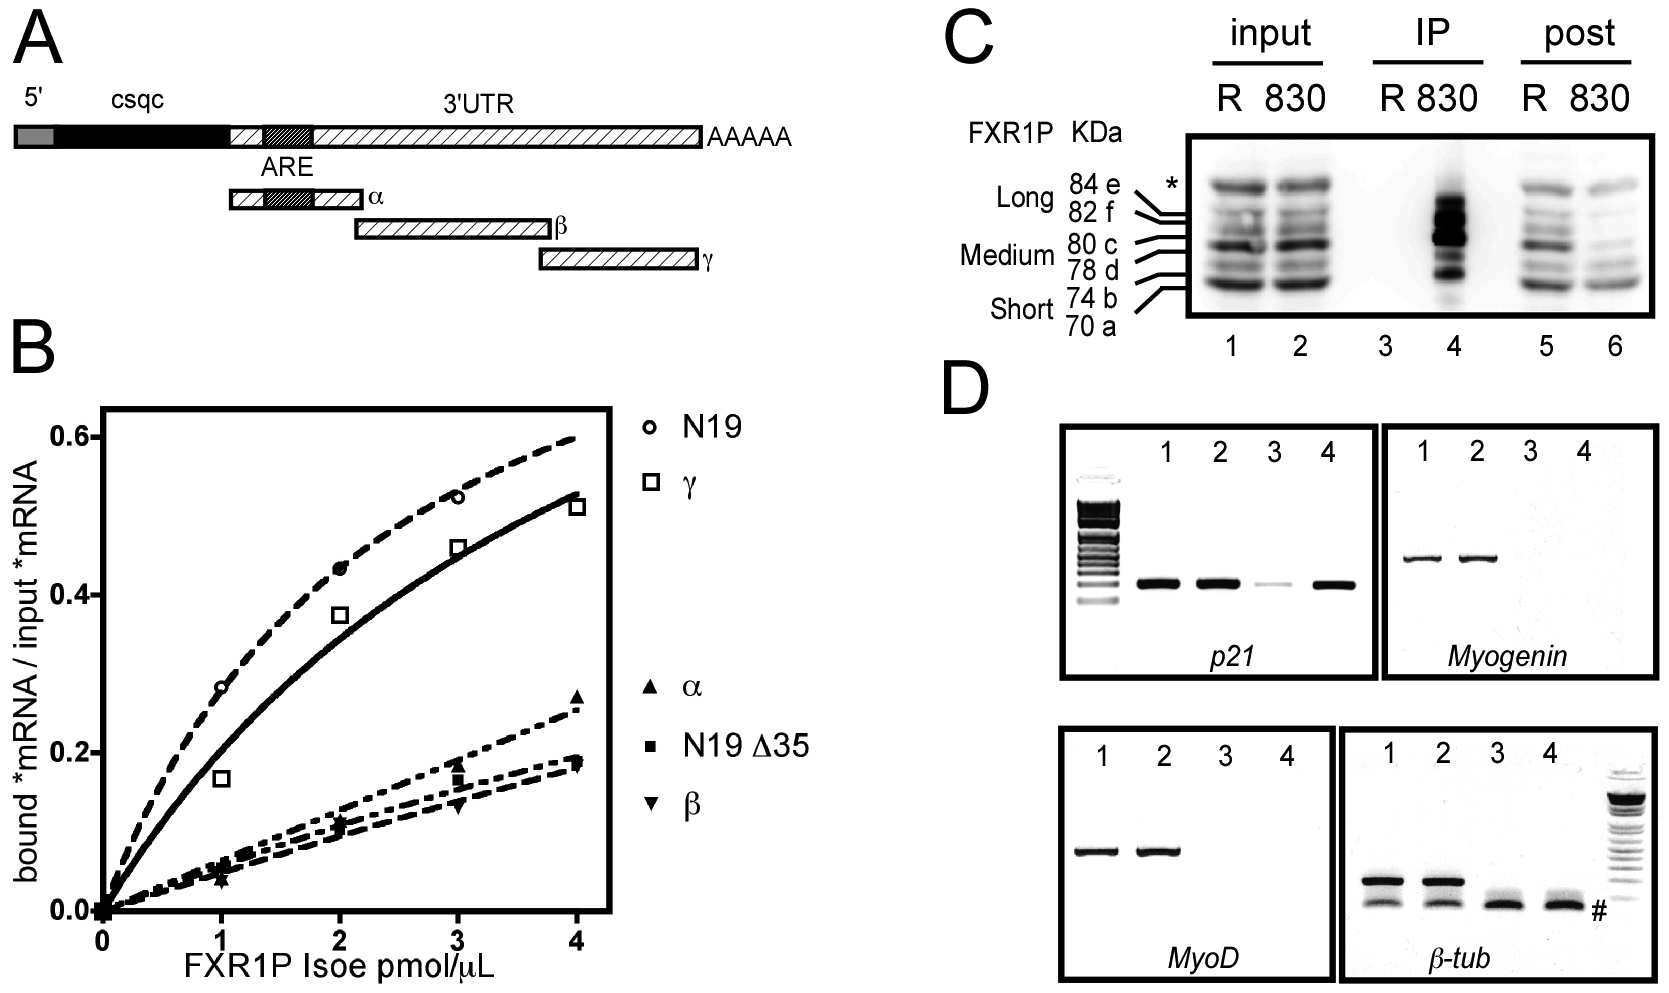 FXR1P selectively binds <i>in vitro</i> to the distal portion of <i>p21</i> mRNA 3′ UTR and associates <i>in vivo</i> with <i>p21</i> mRNA.